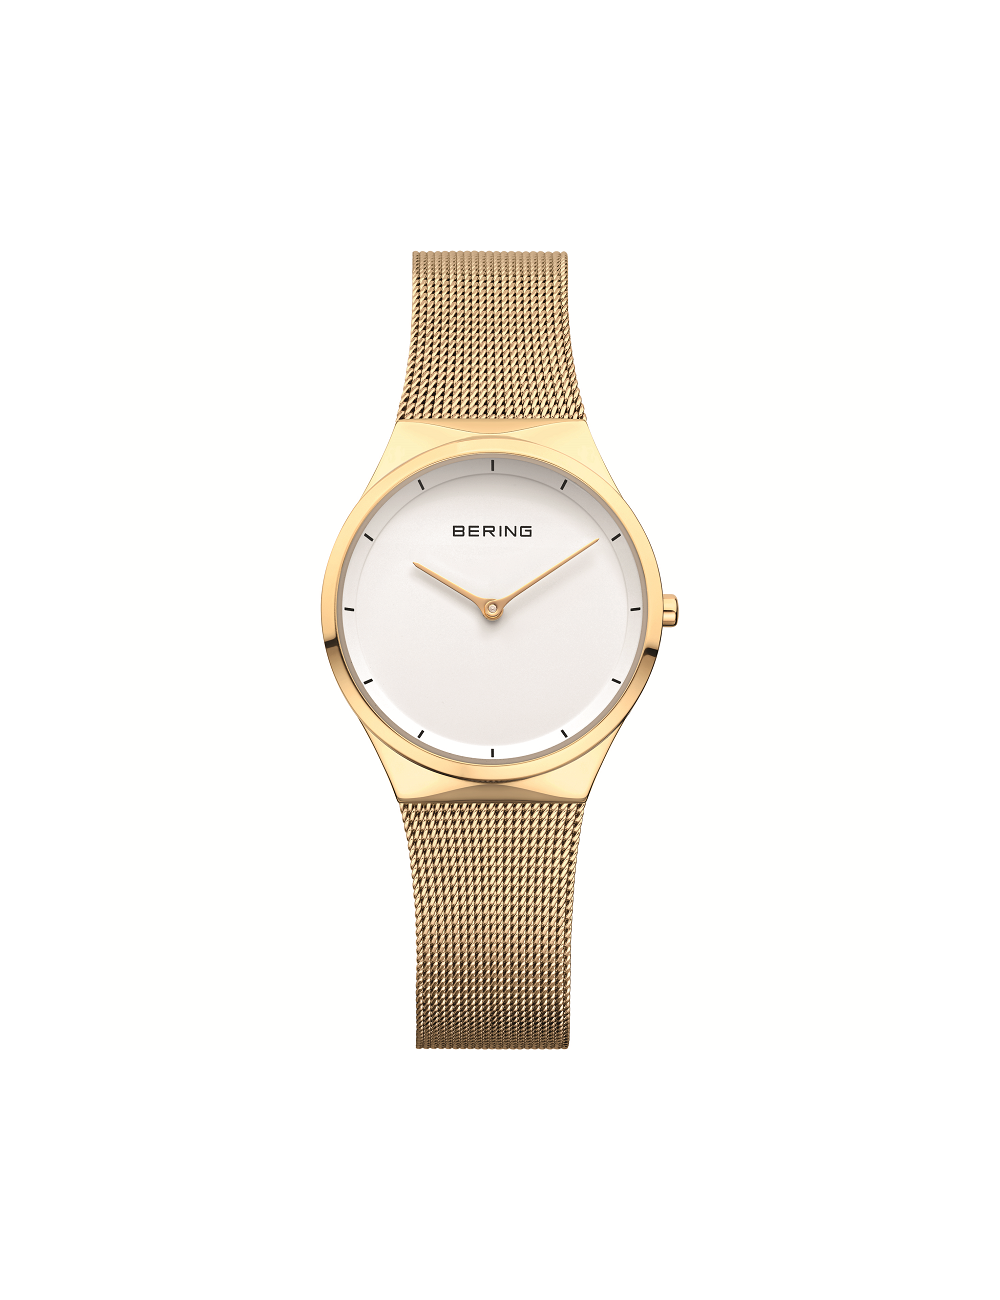 Bering -Bering Classic mujer dorado -12131-339